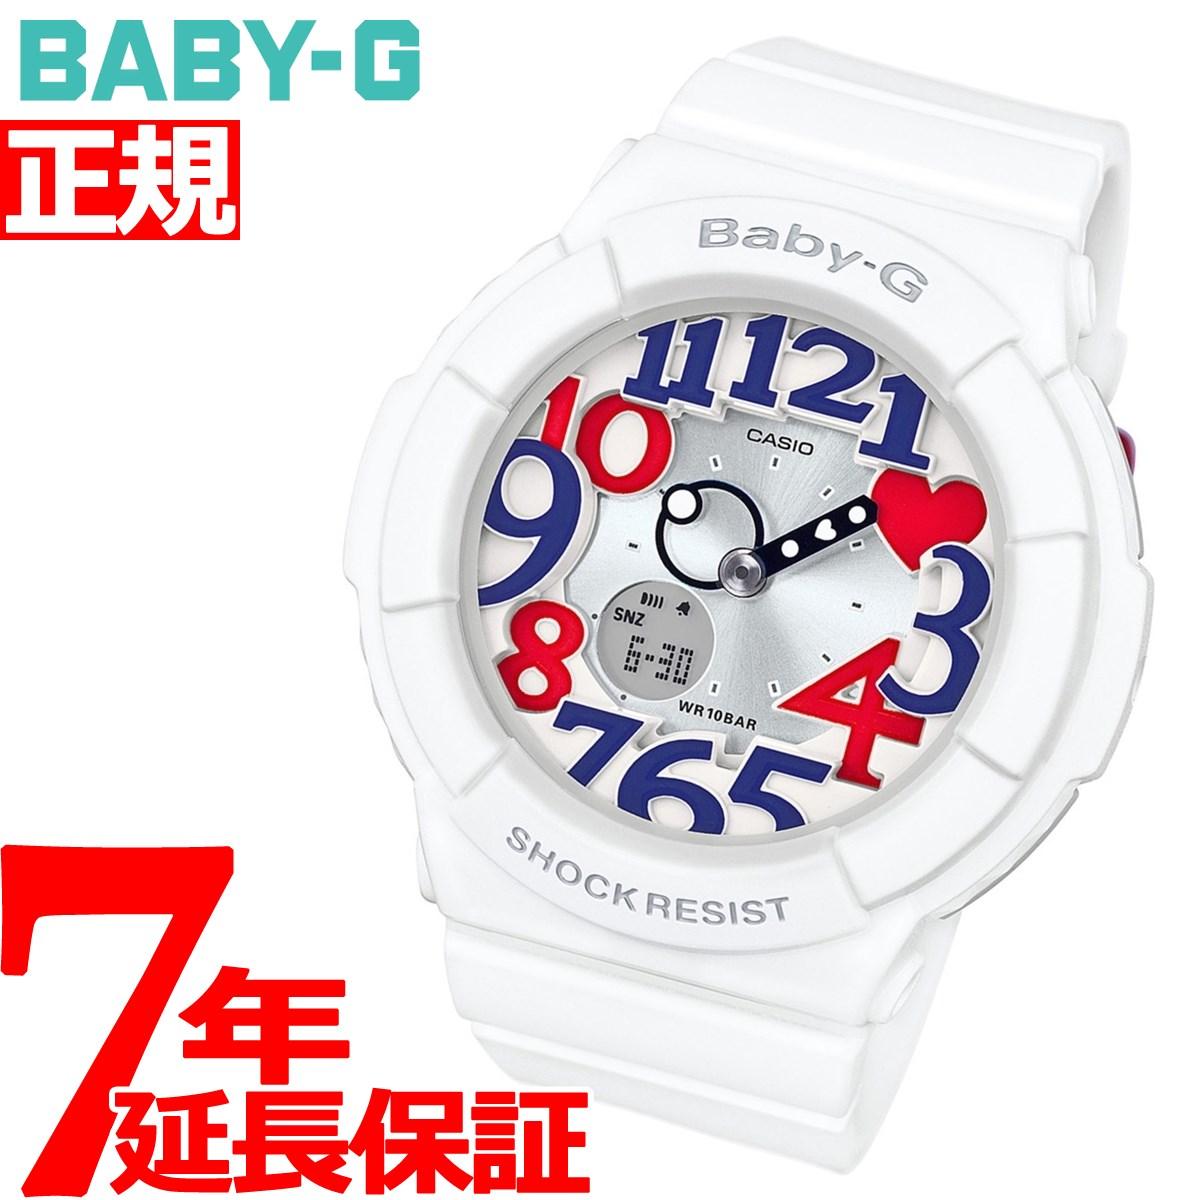 CASIO BABY-G カシオ ベビーG 腕時計 レディース ホワイト・トリコロール アナデジ BGA-130TR-7BJF